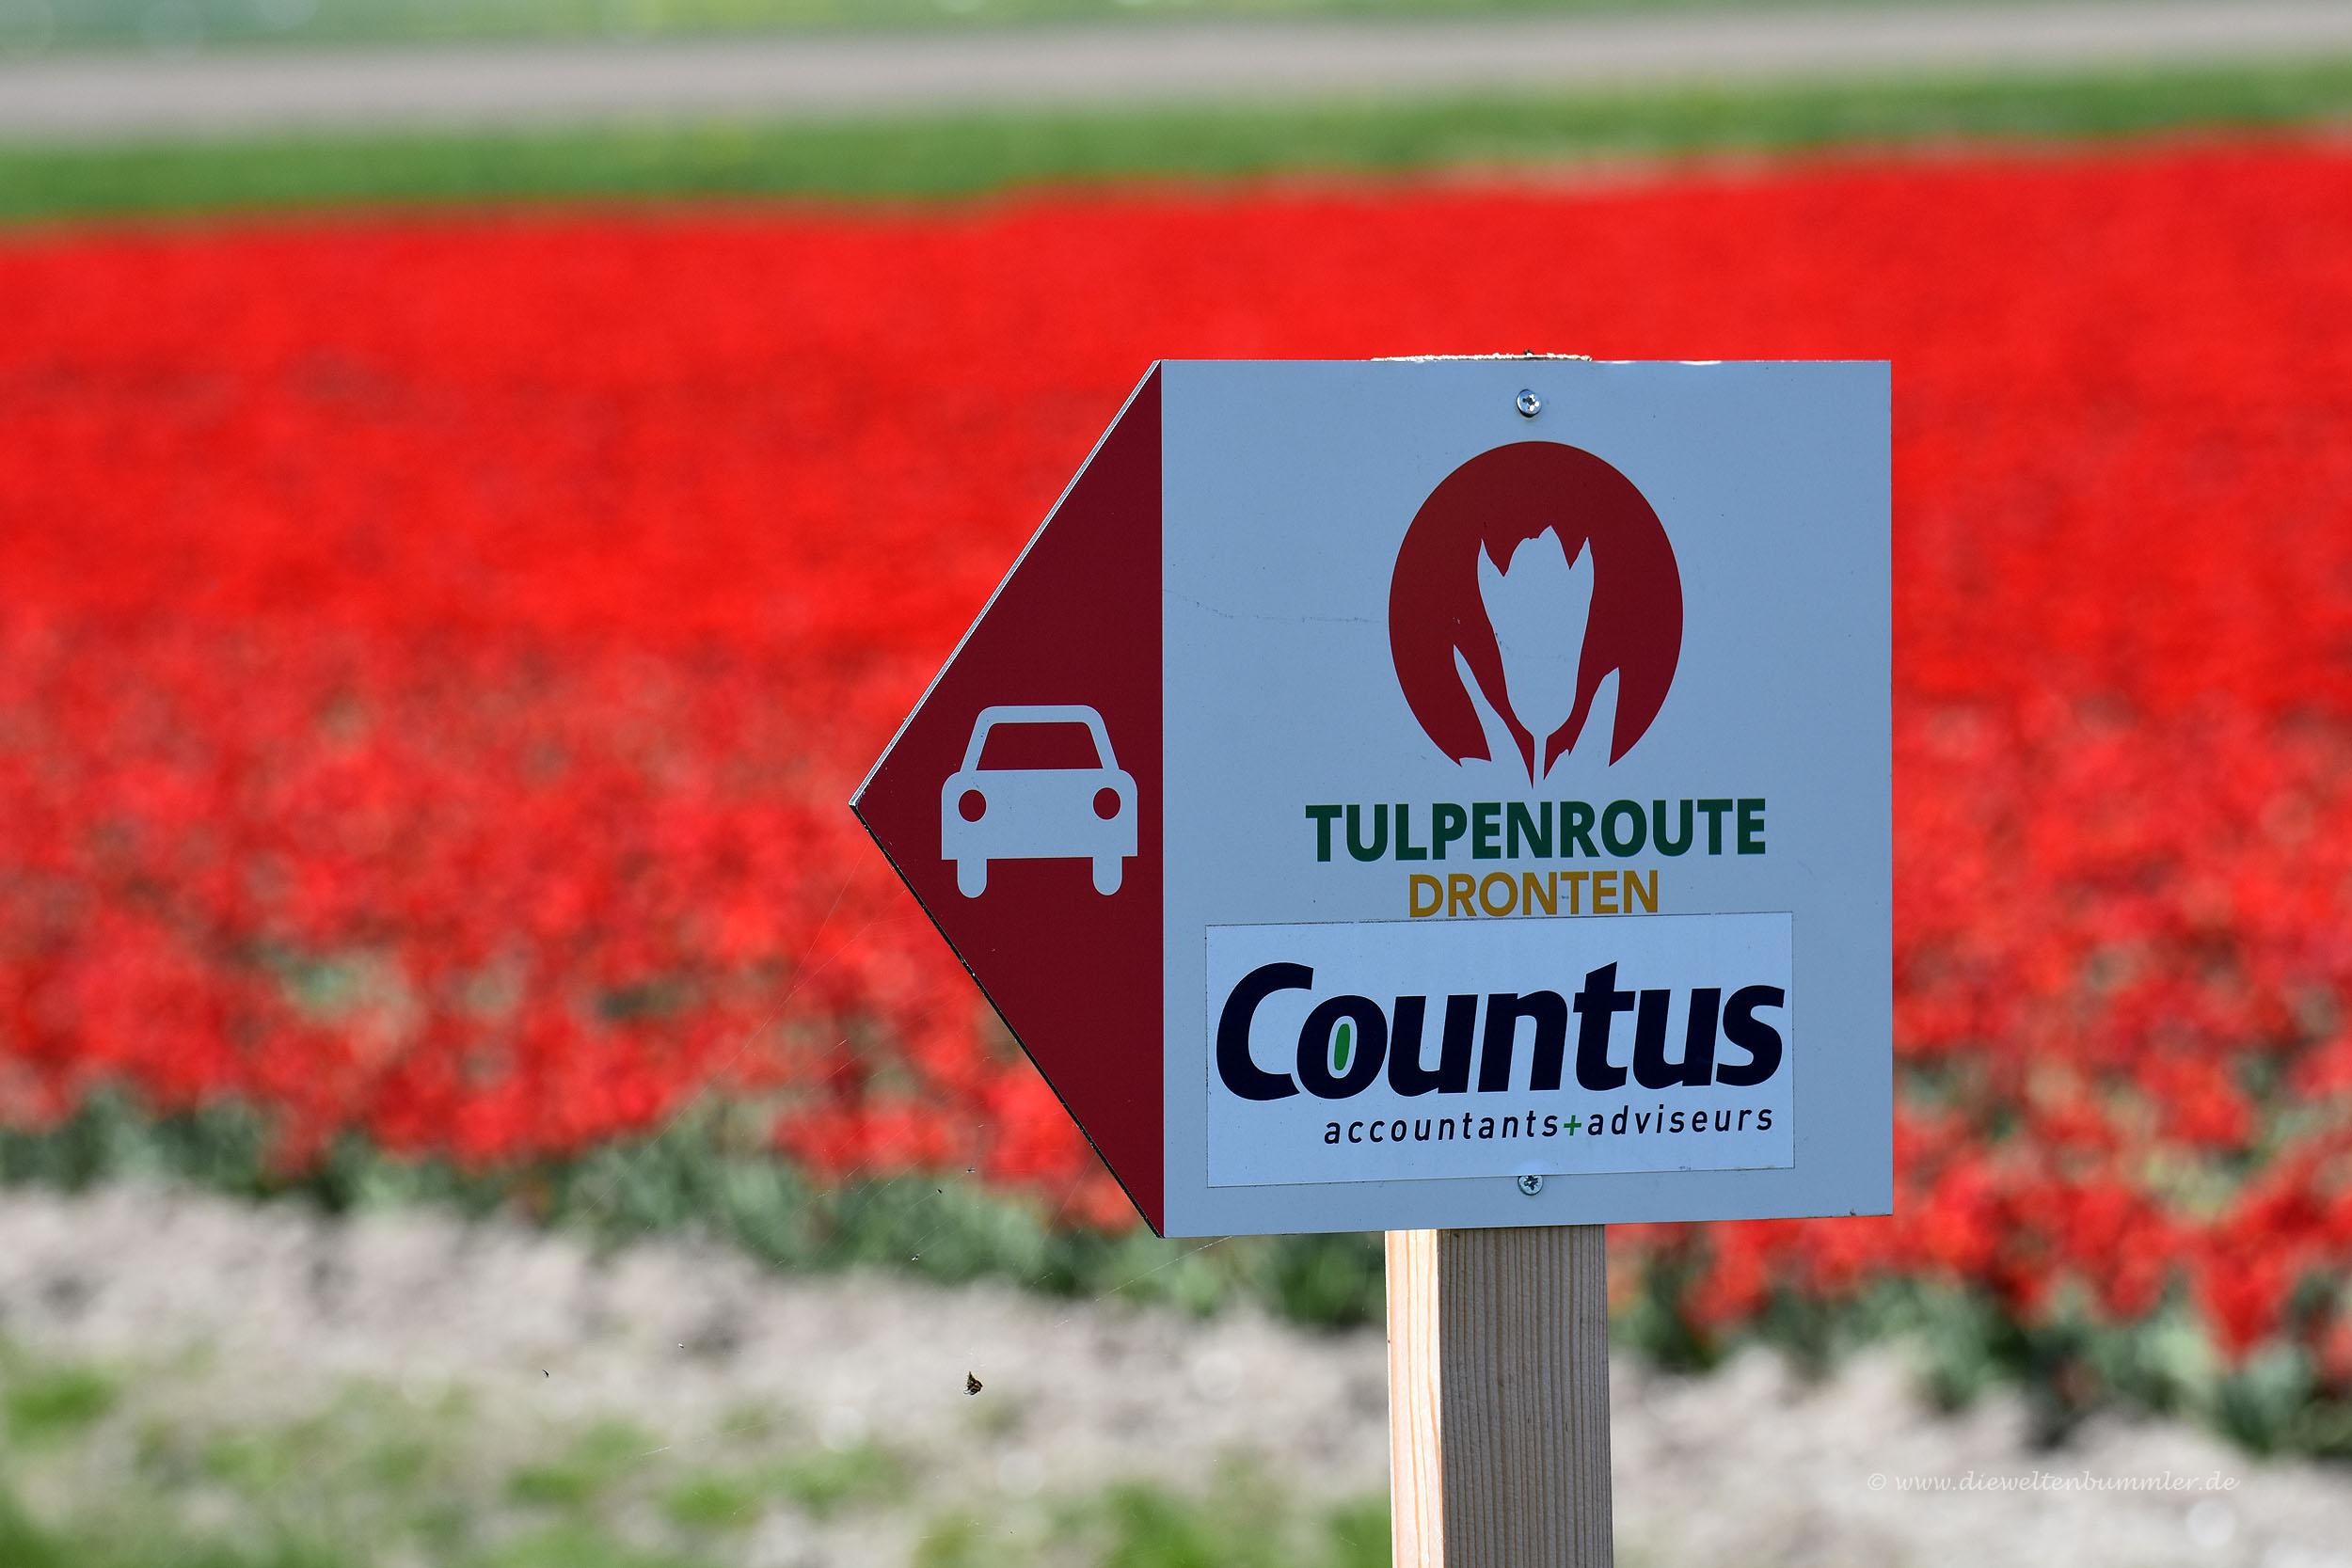 Wir folgten der Tulpenroute